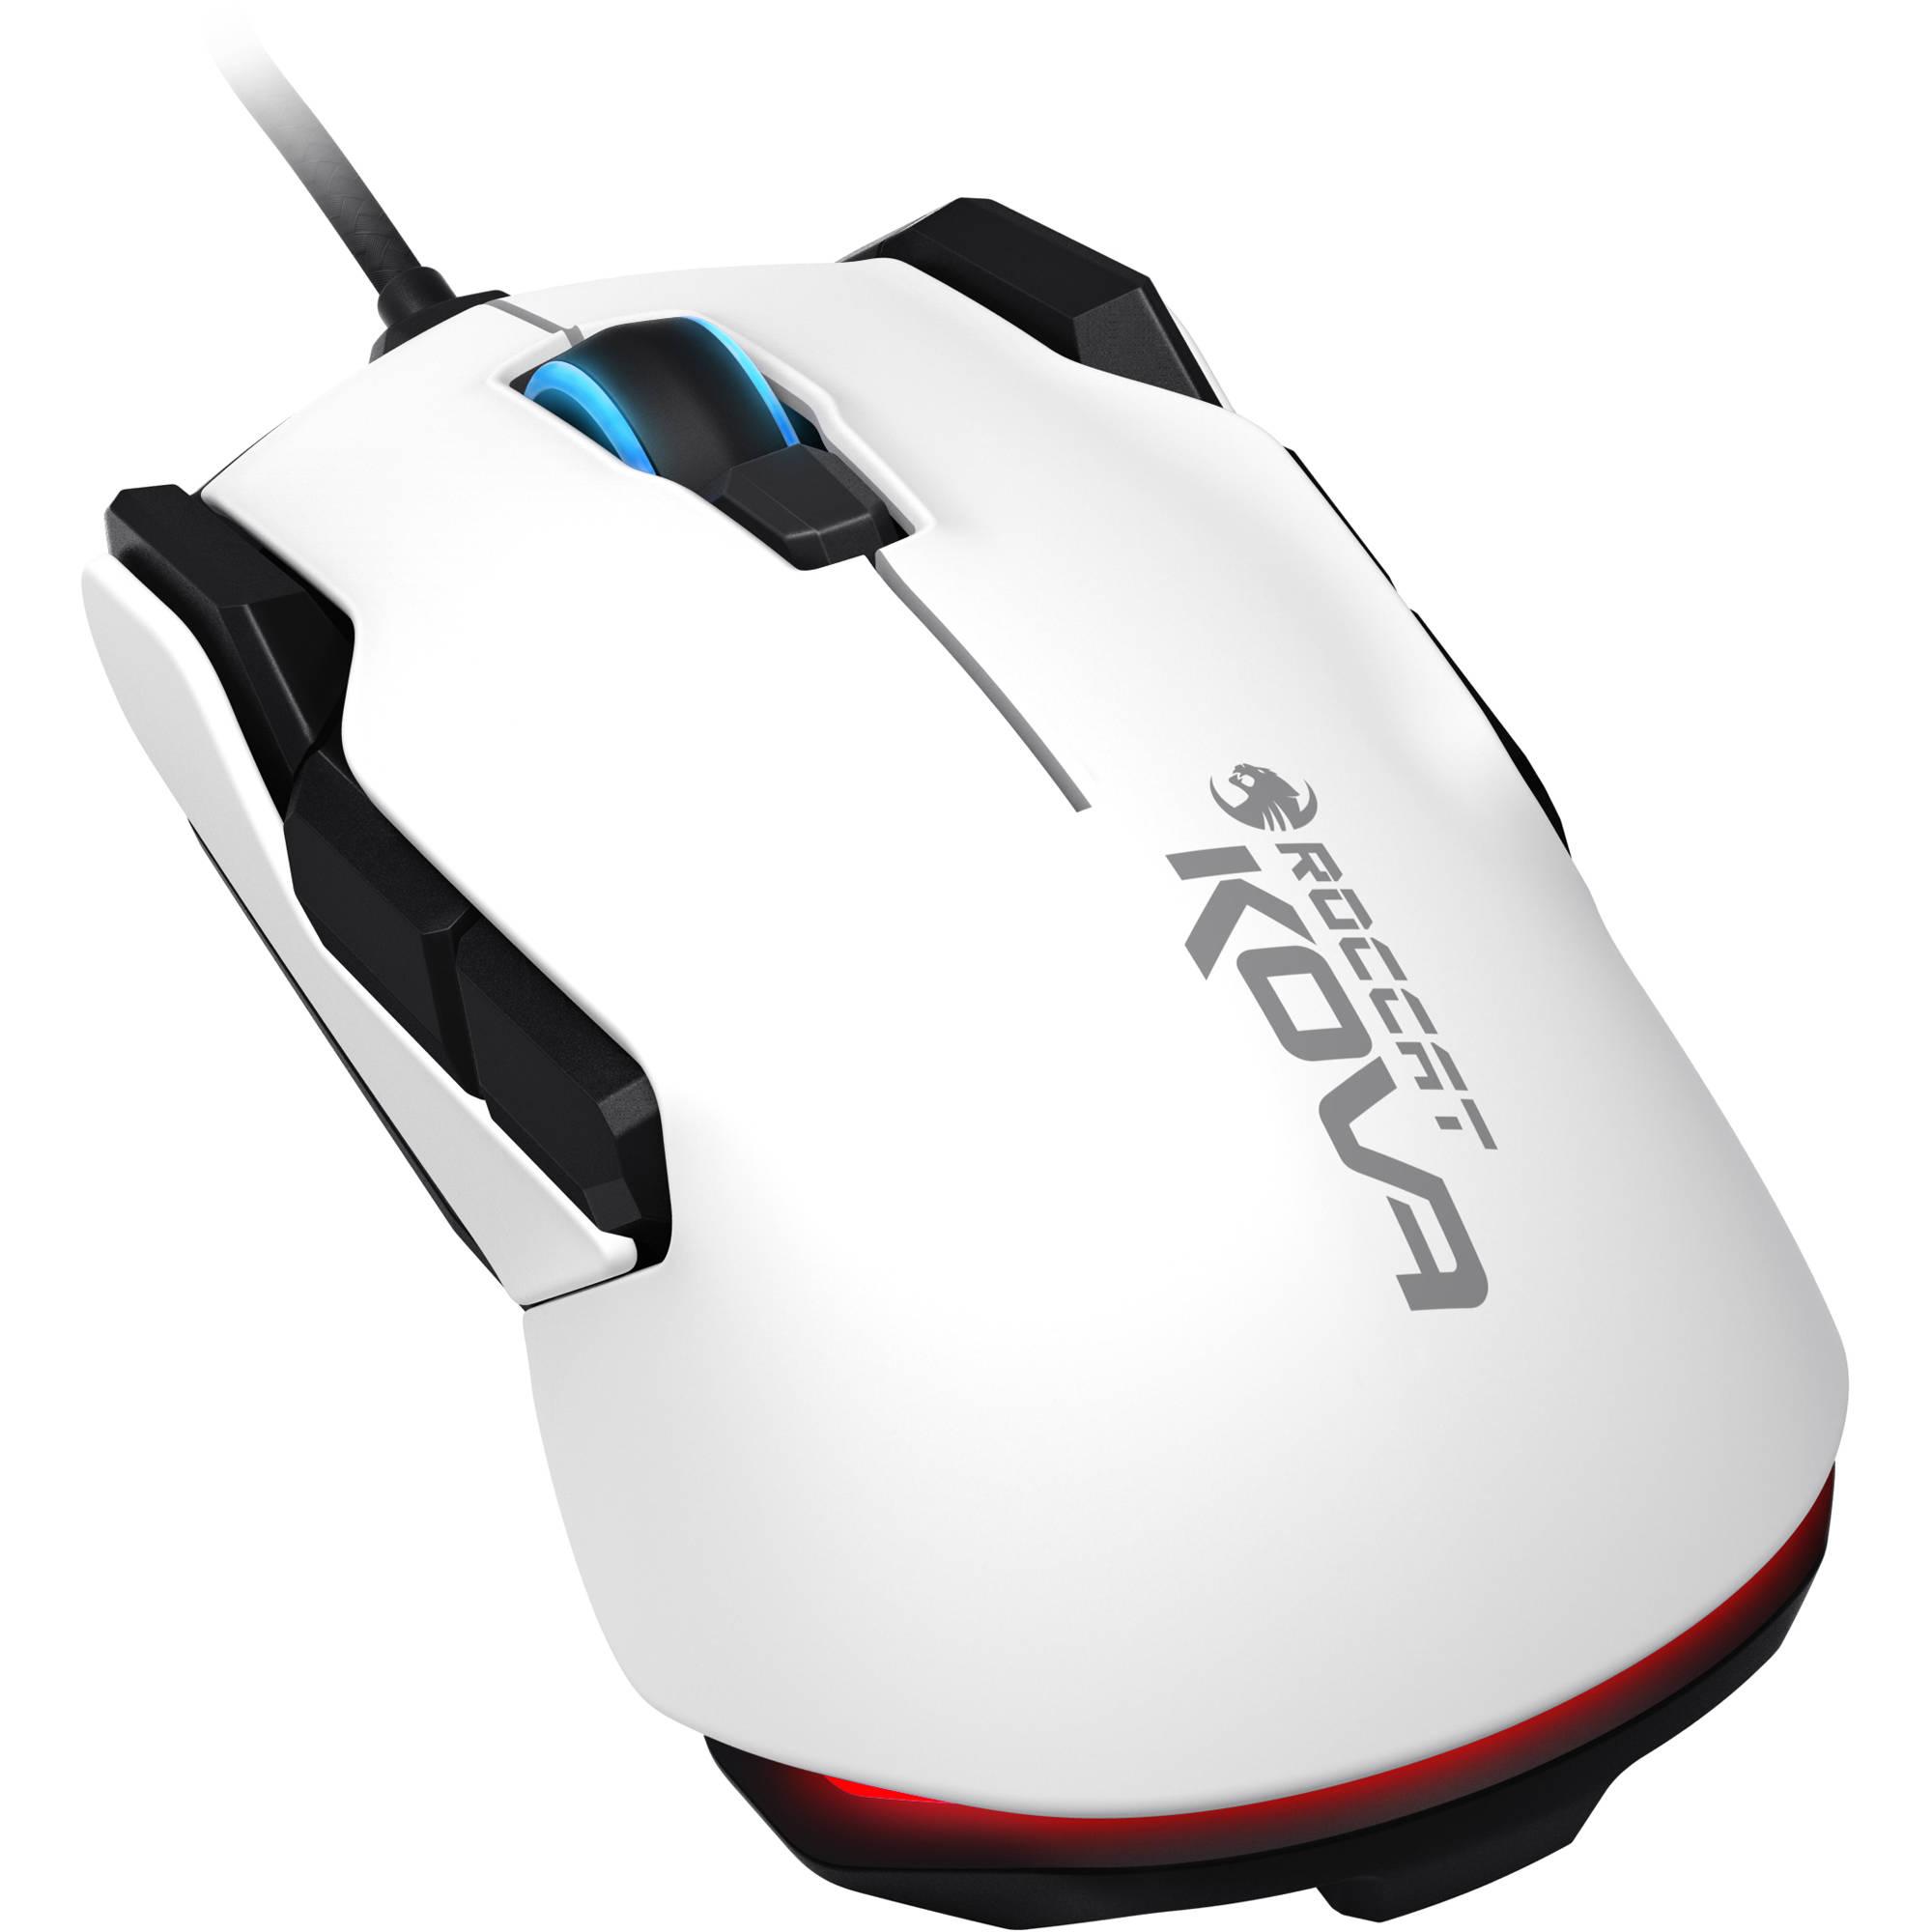 ROCCAT Kova Mouse Drivers